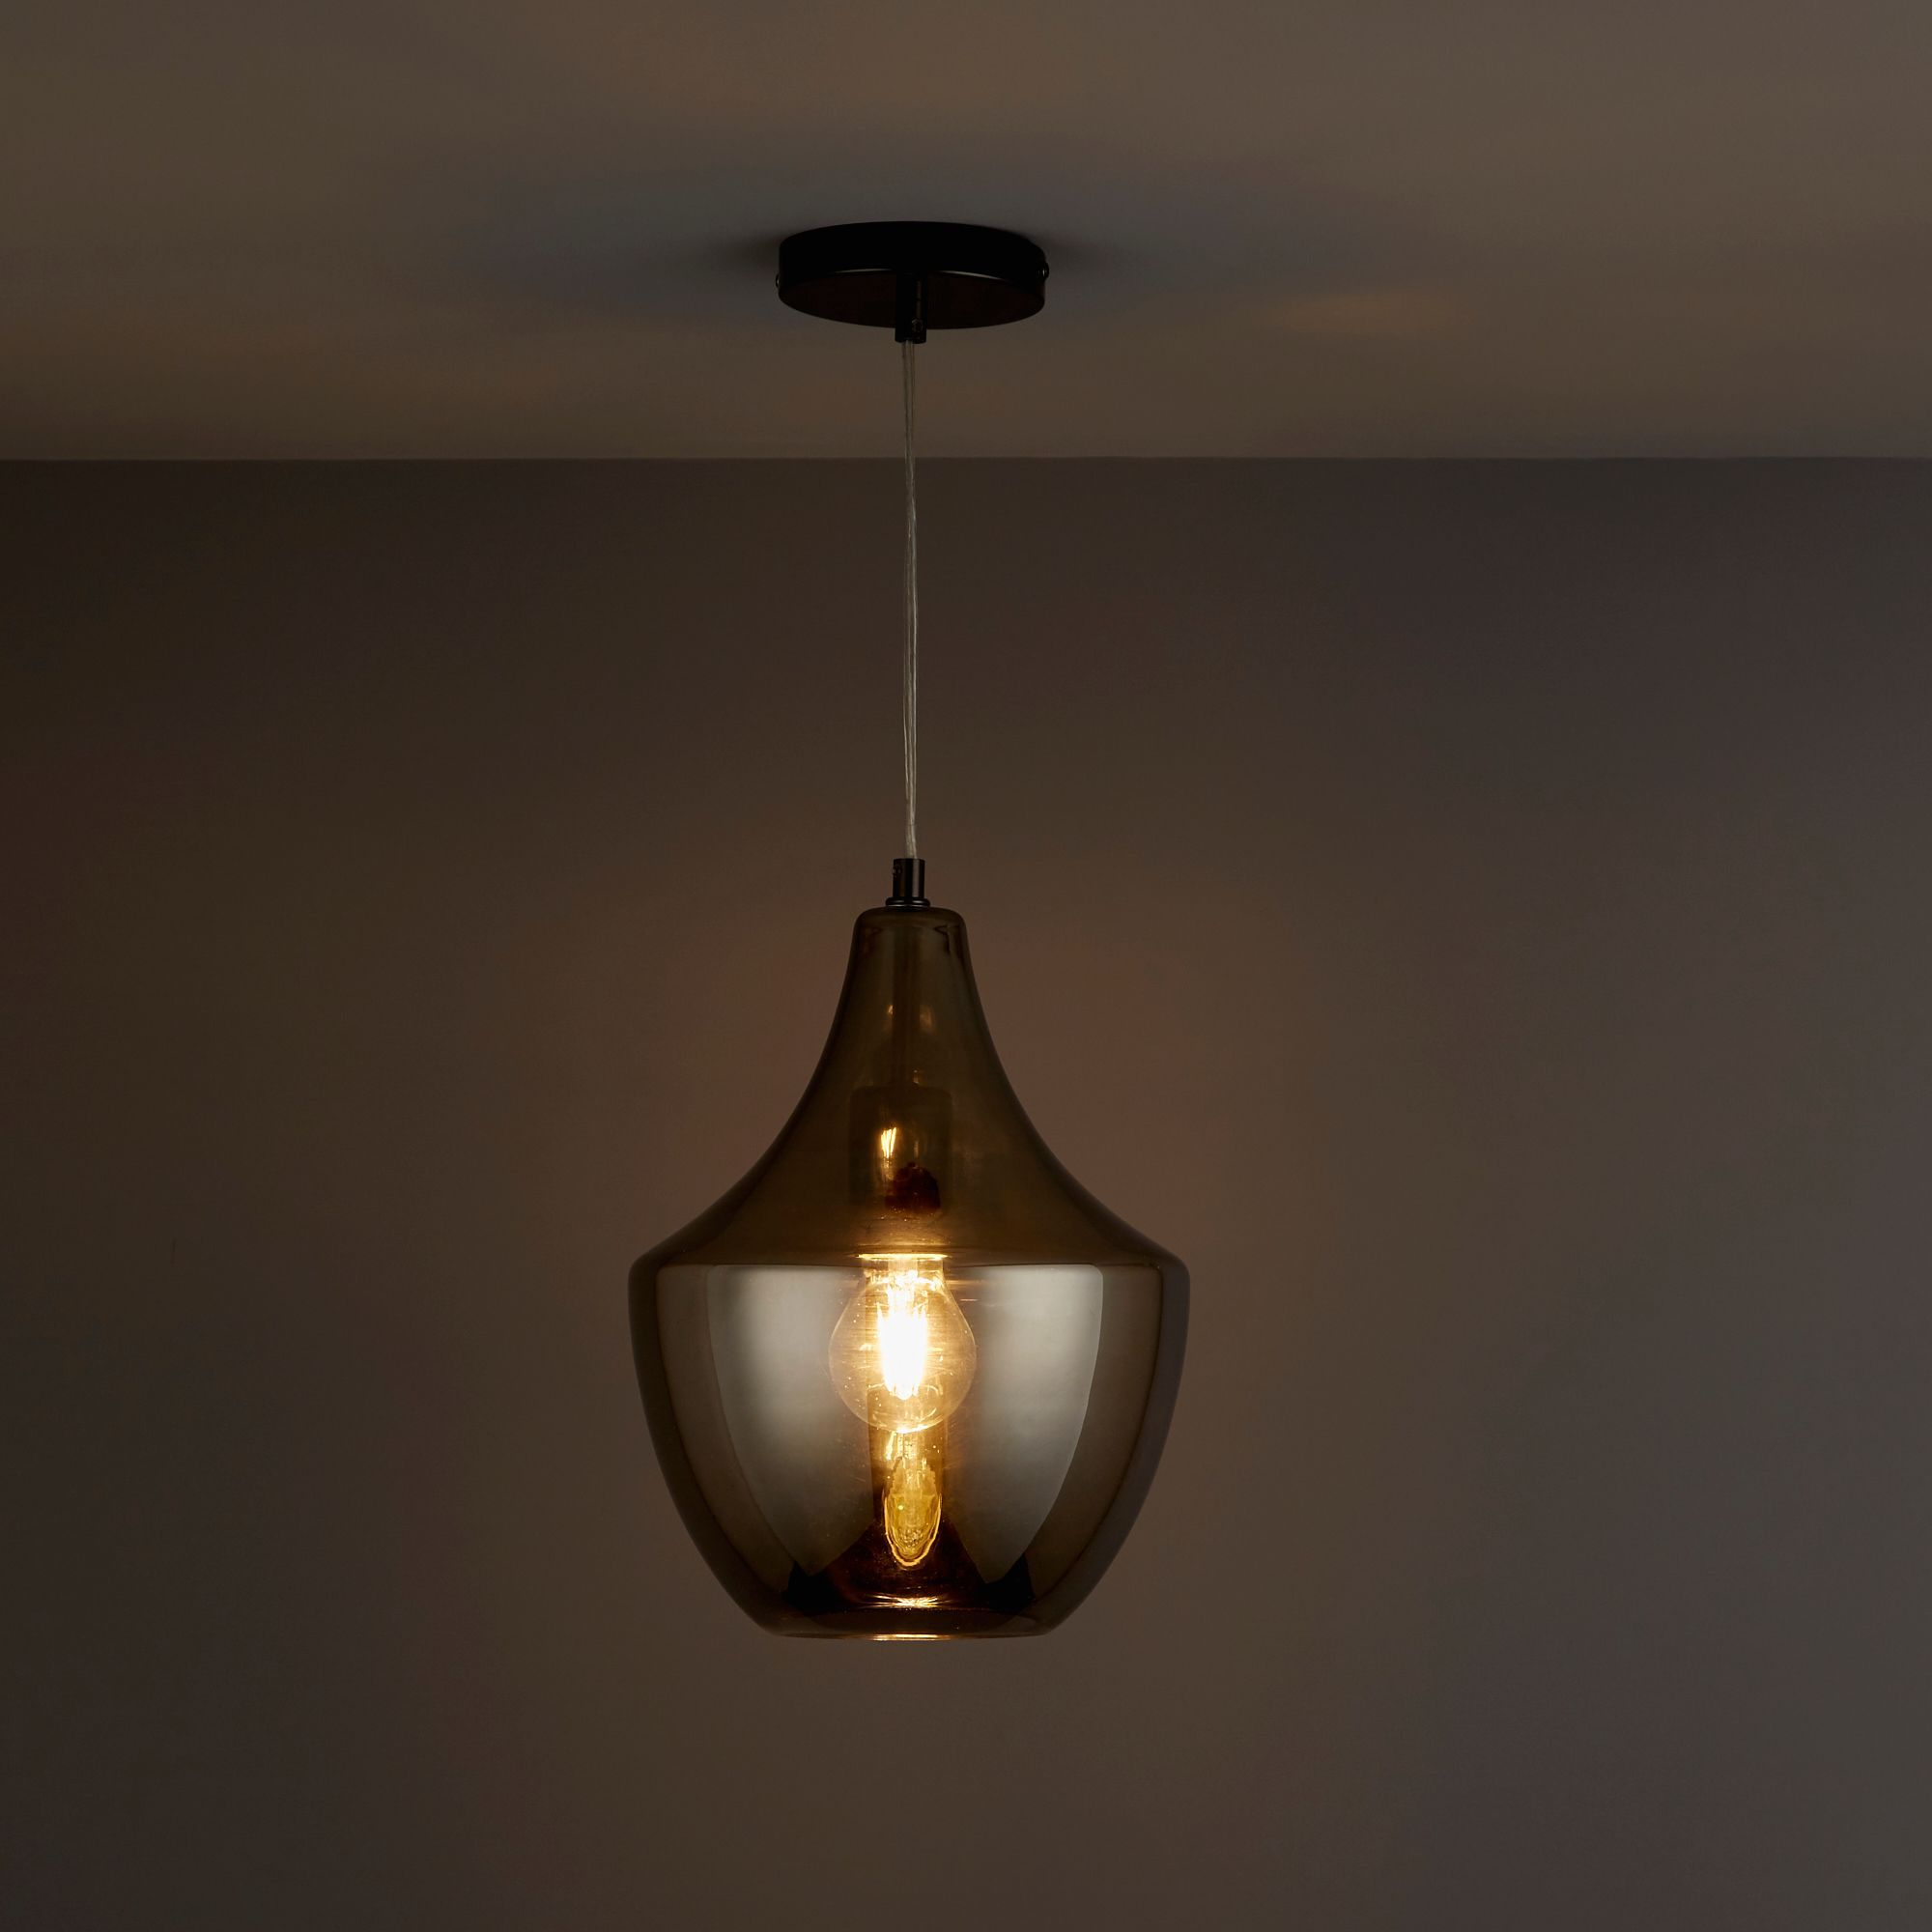 honor smoked pendant ceiling light departments diy  bq